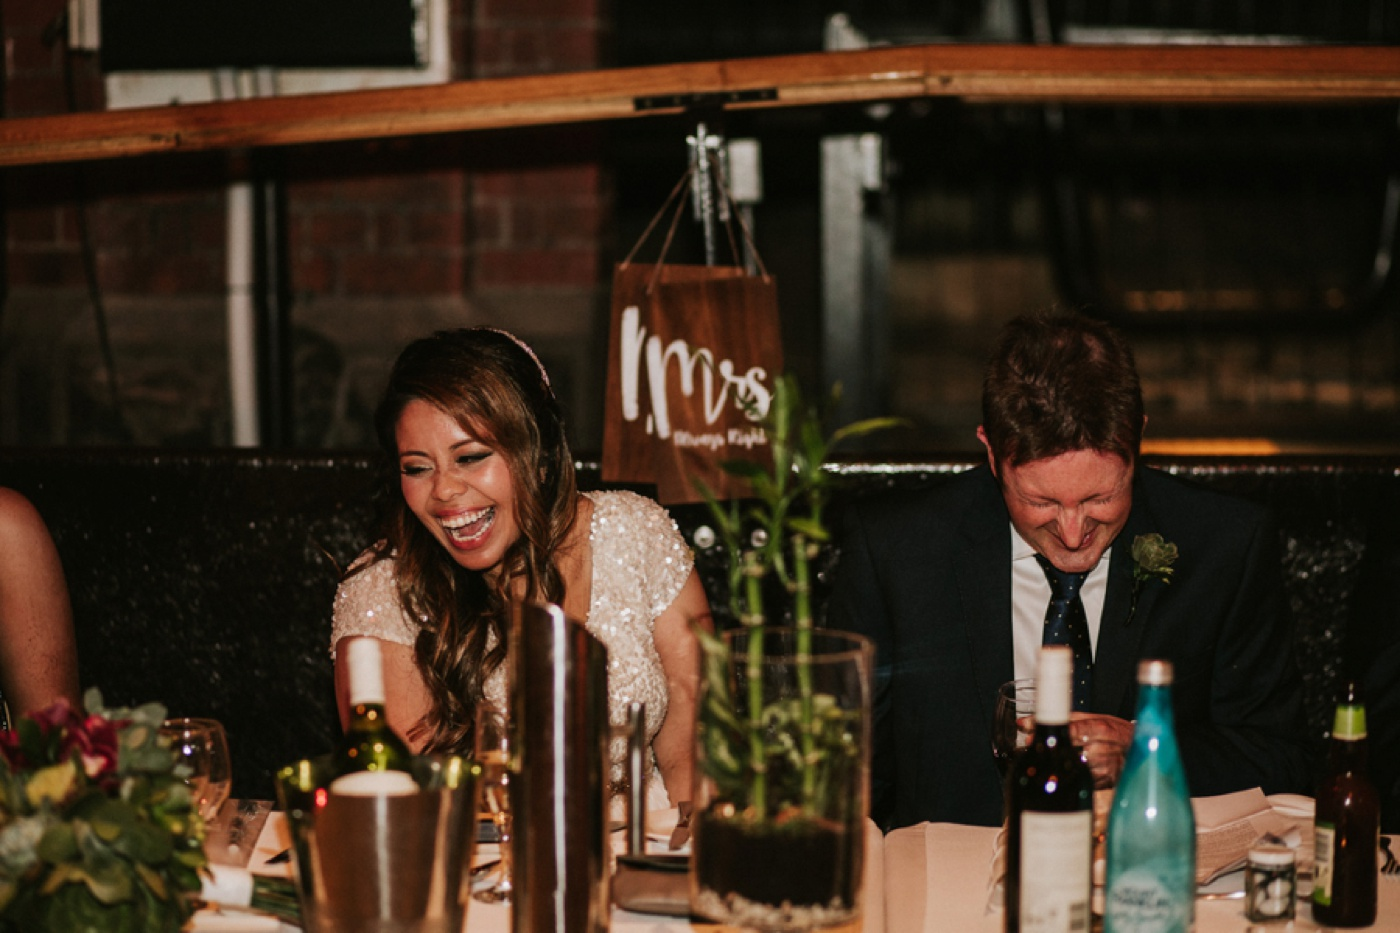 anitadaniel_melbourne-scienceworks-relaxed-fun-geek-wedding_melbourne-candid-wedding-photography_82